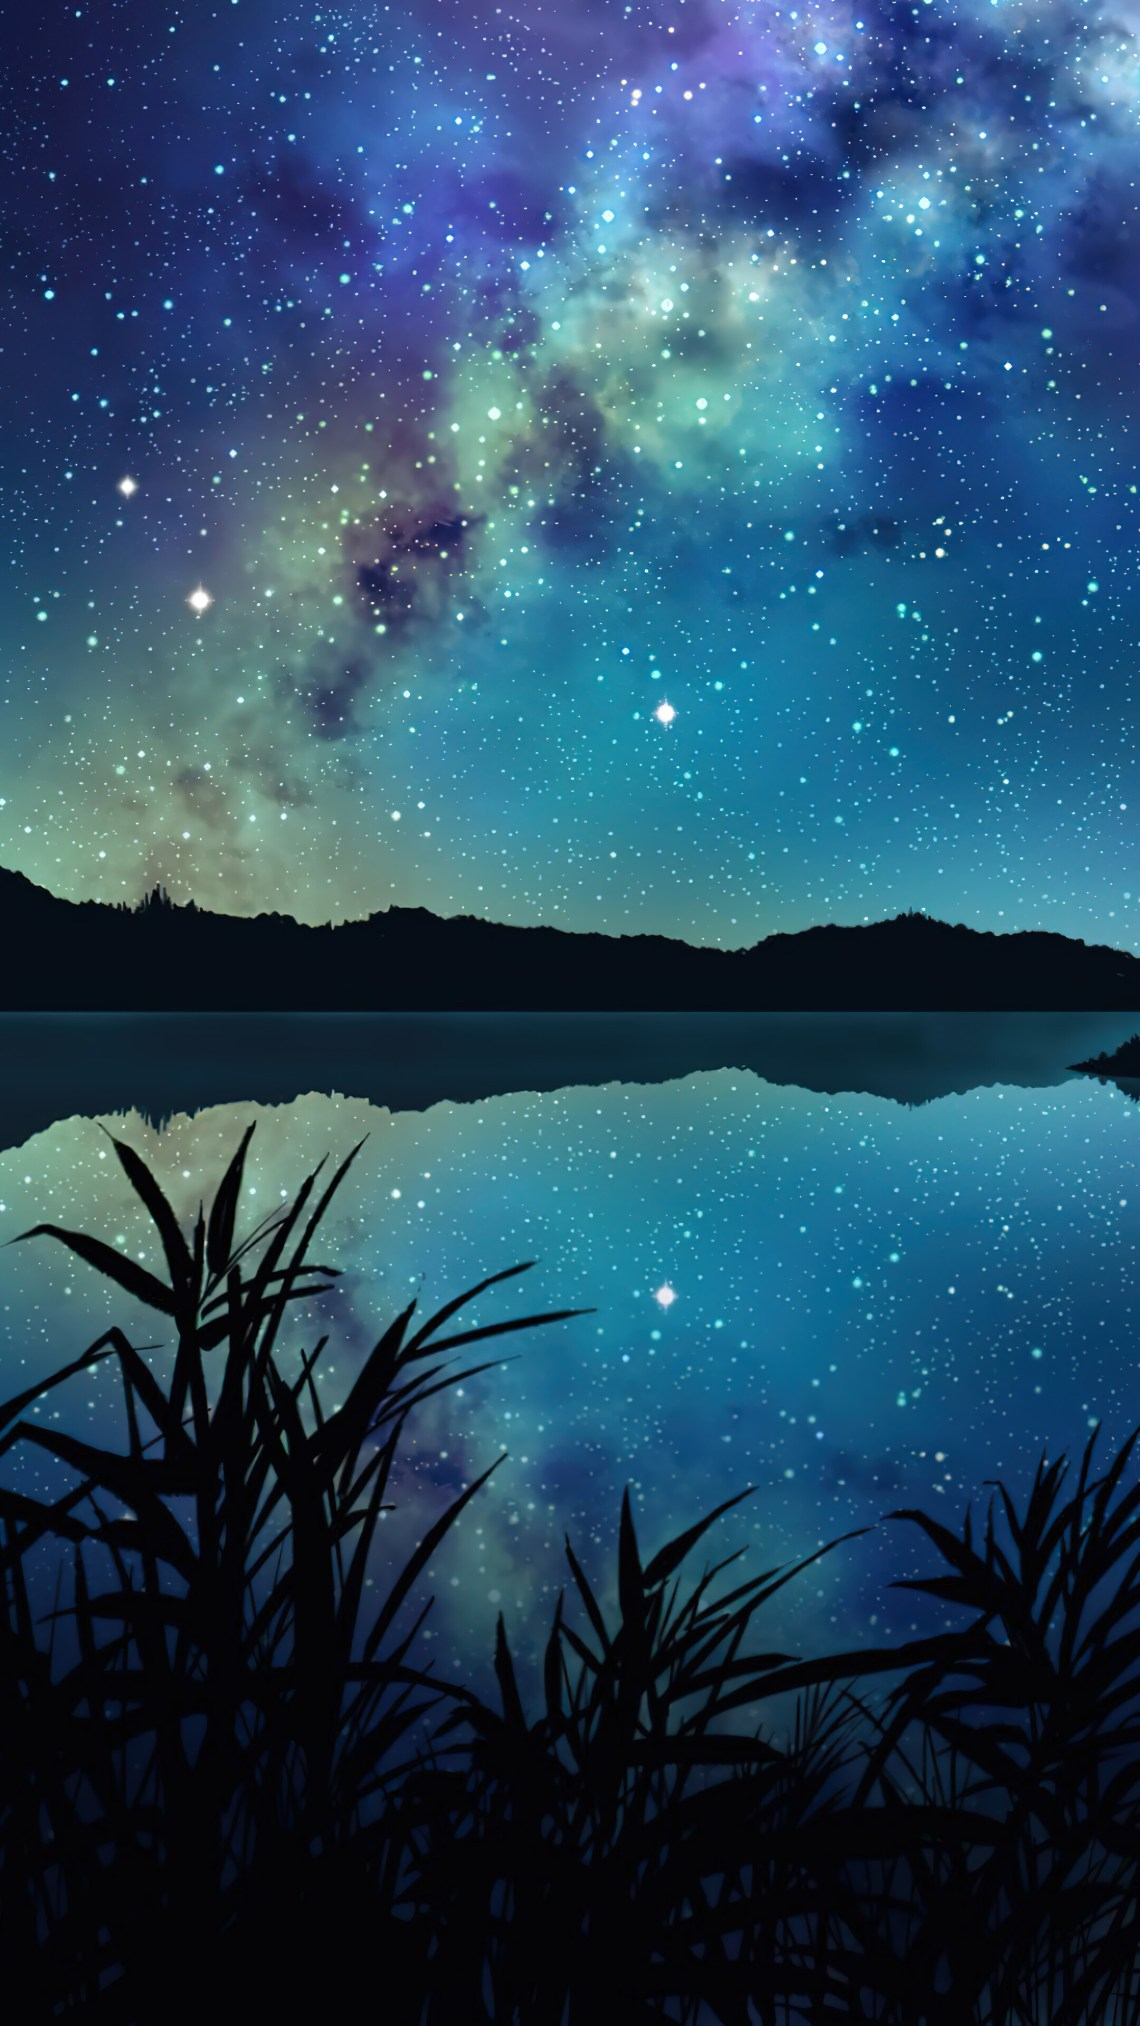 Starry Stars Night Sky Milky Way Anime Scenery Art Hd 4k Wallpaper 8 2902